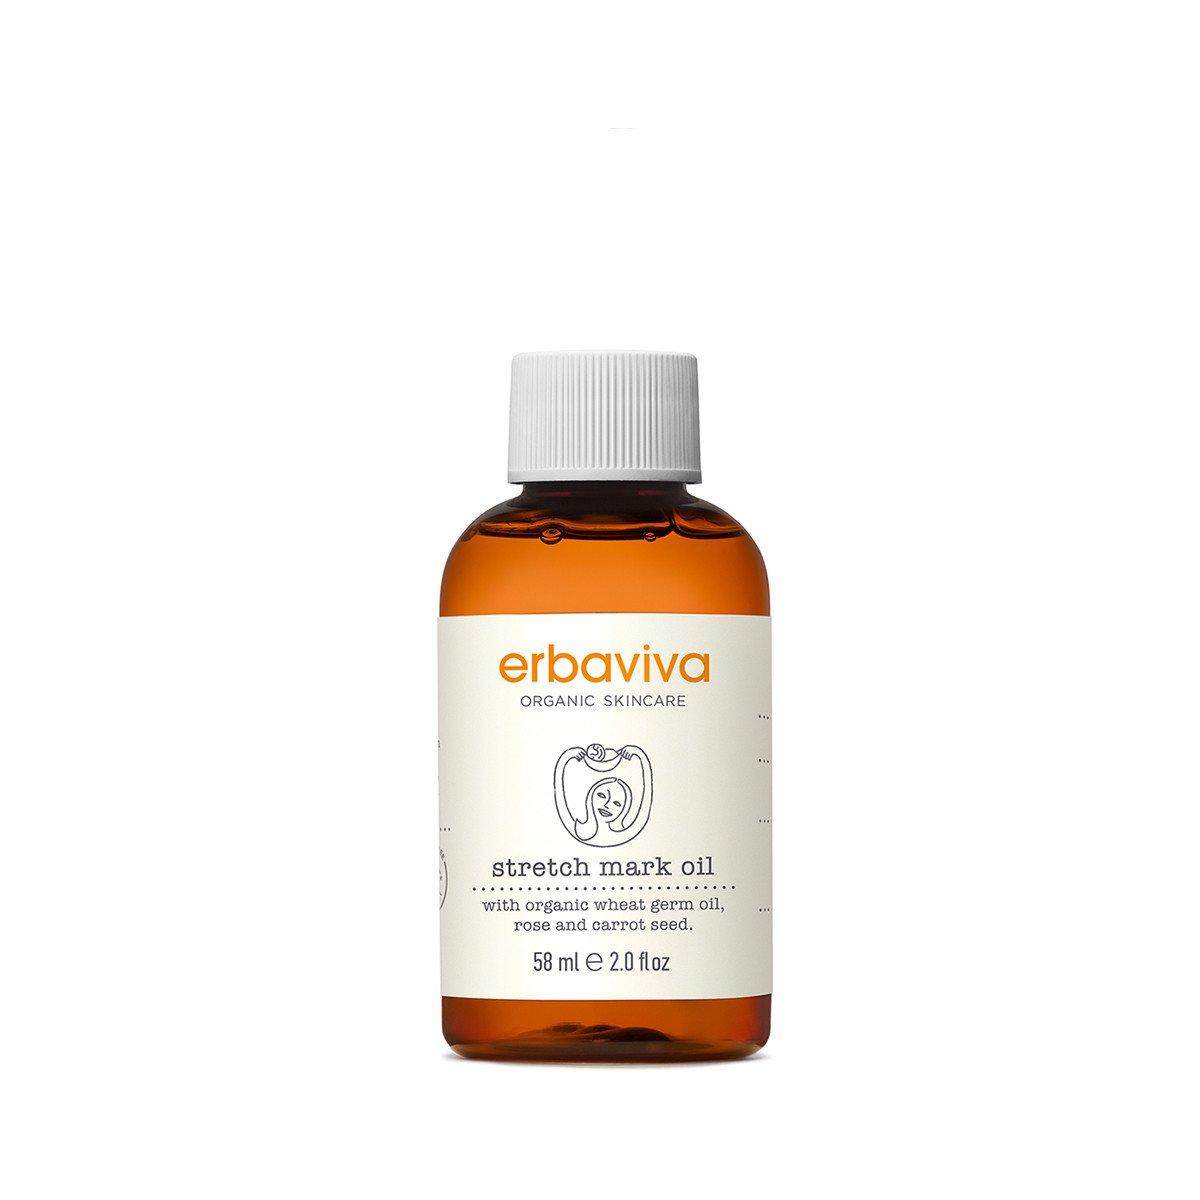 Erbaviva Stretch Mark Oil (2 oz)